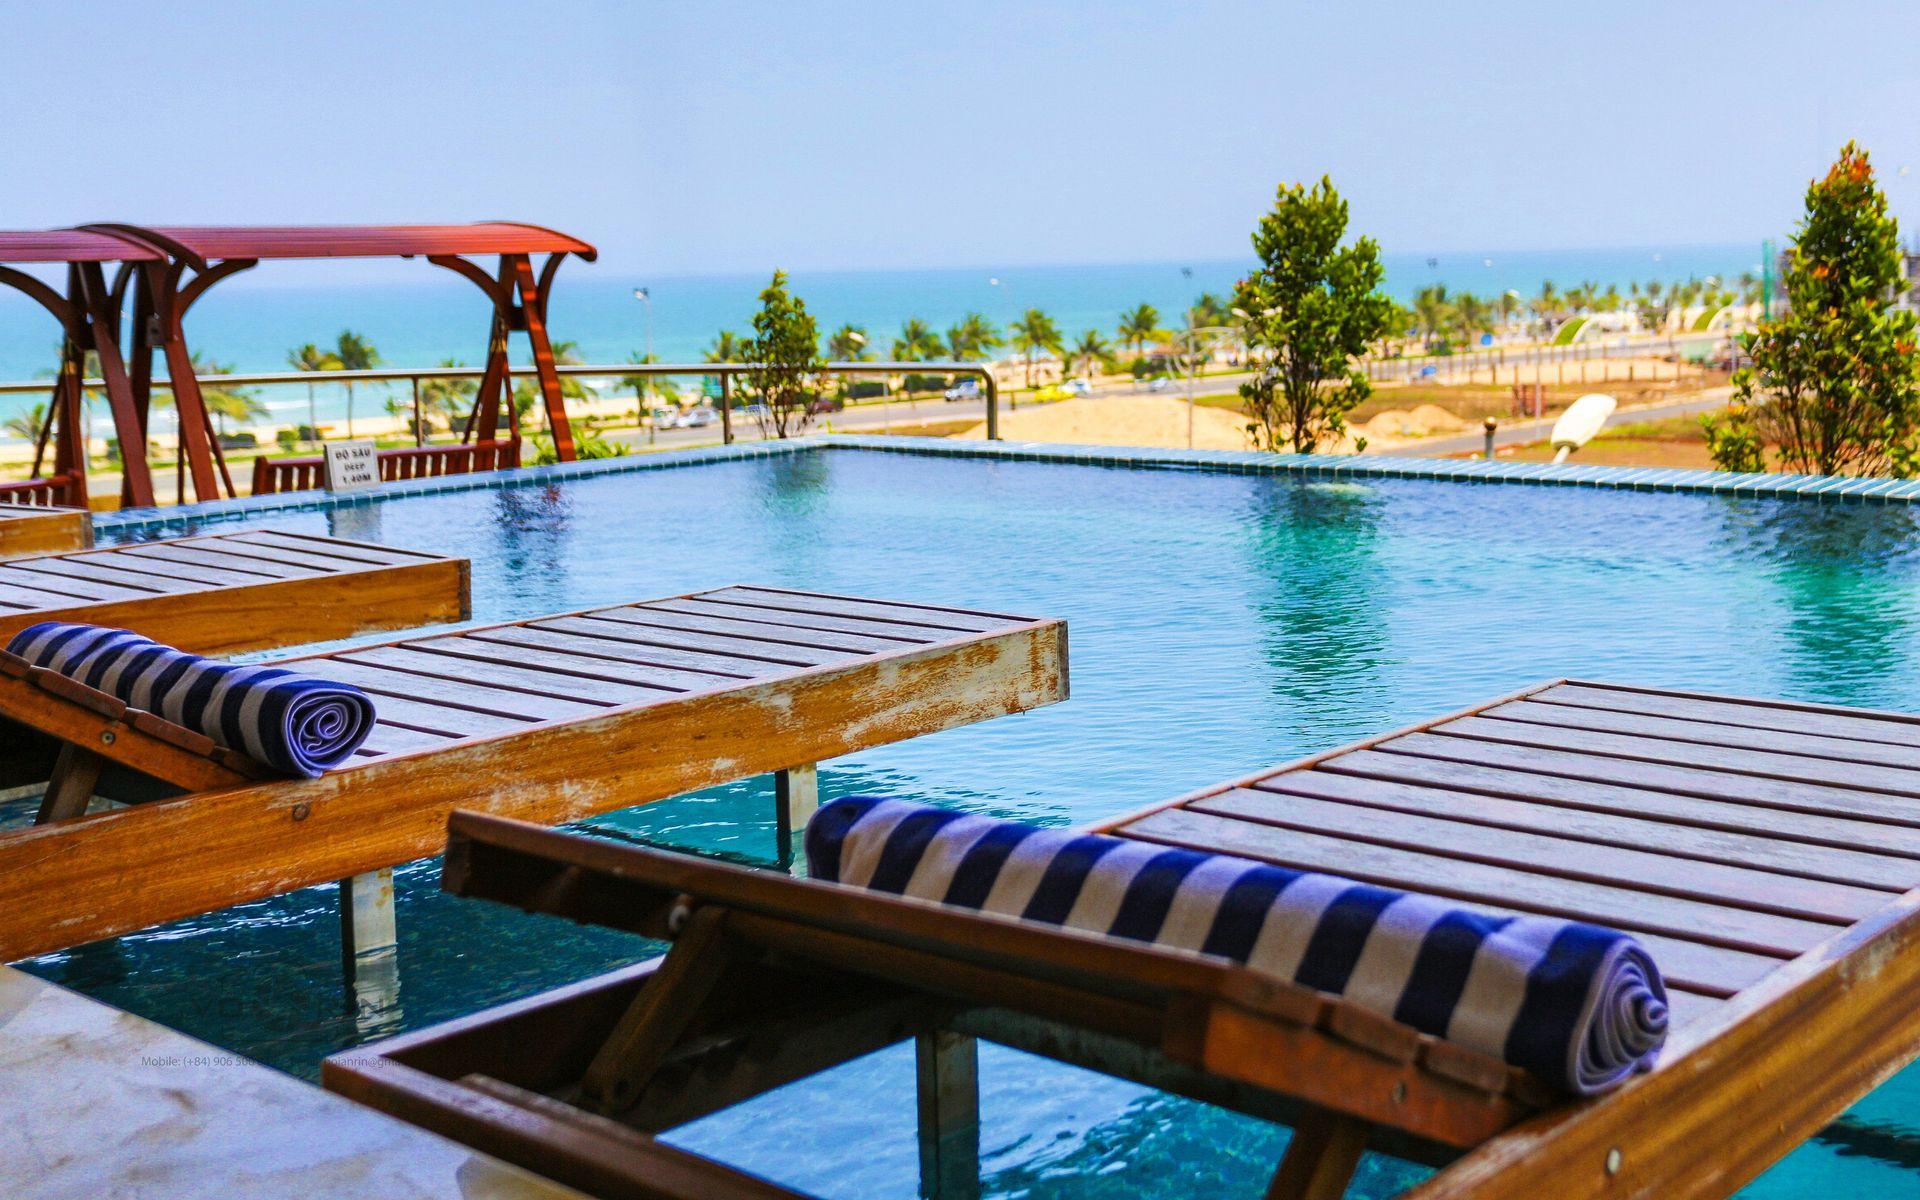 Cicilia Hotels & Spa Da Nang